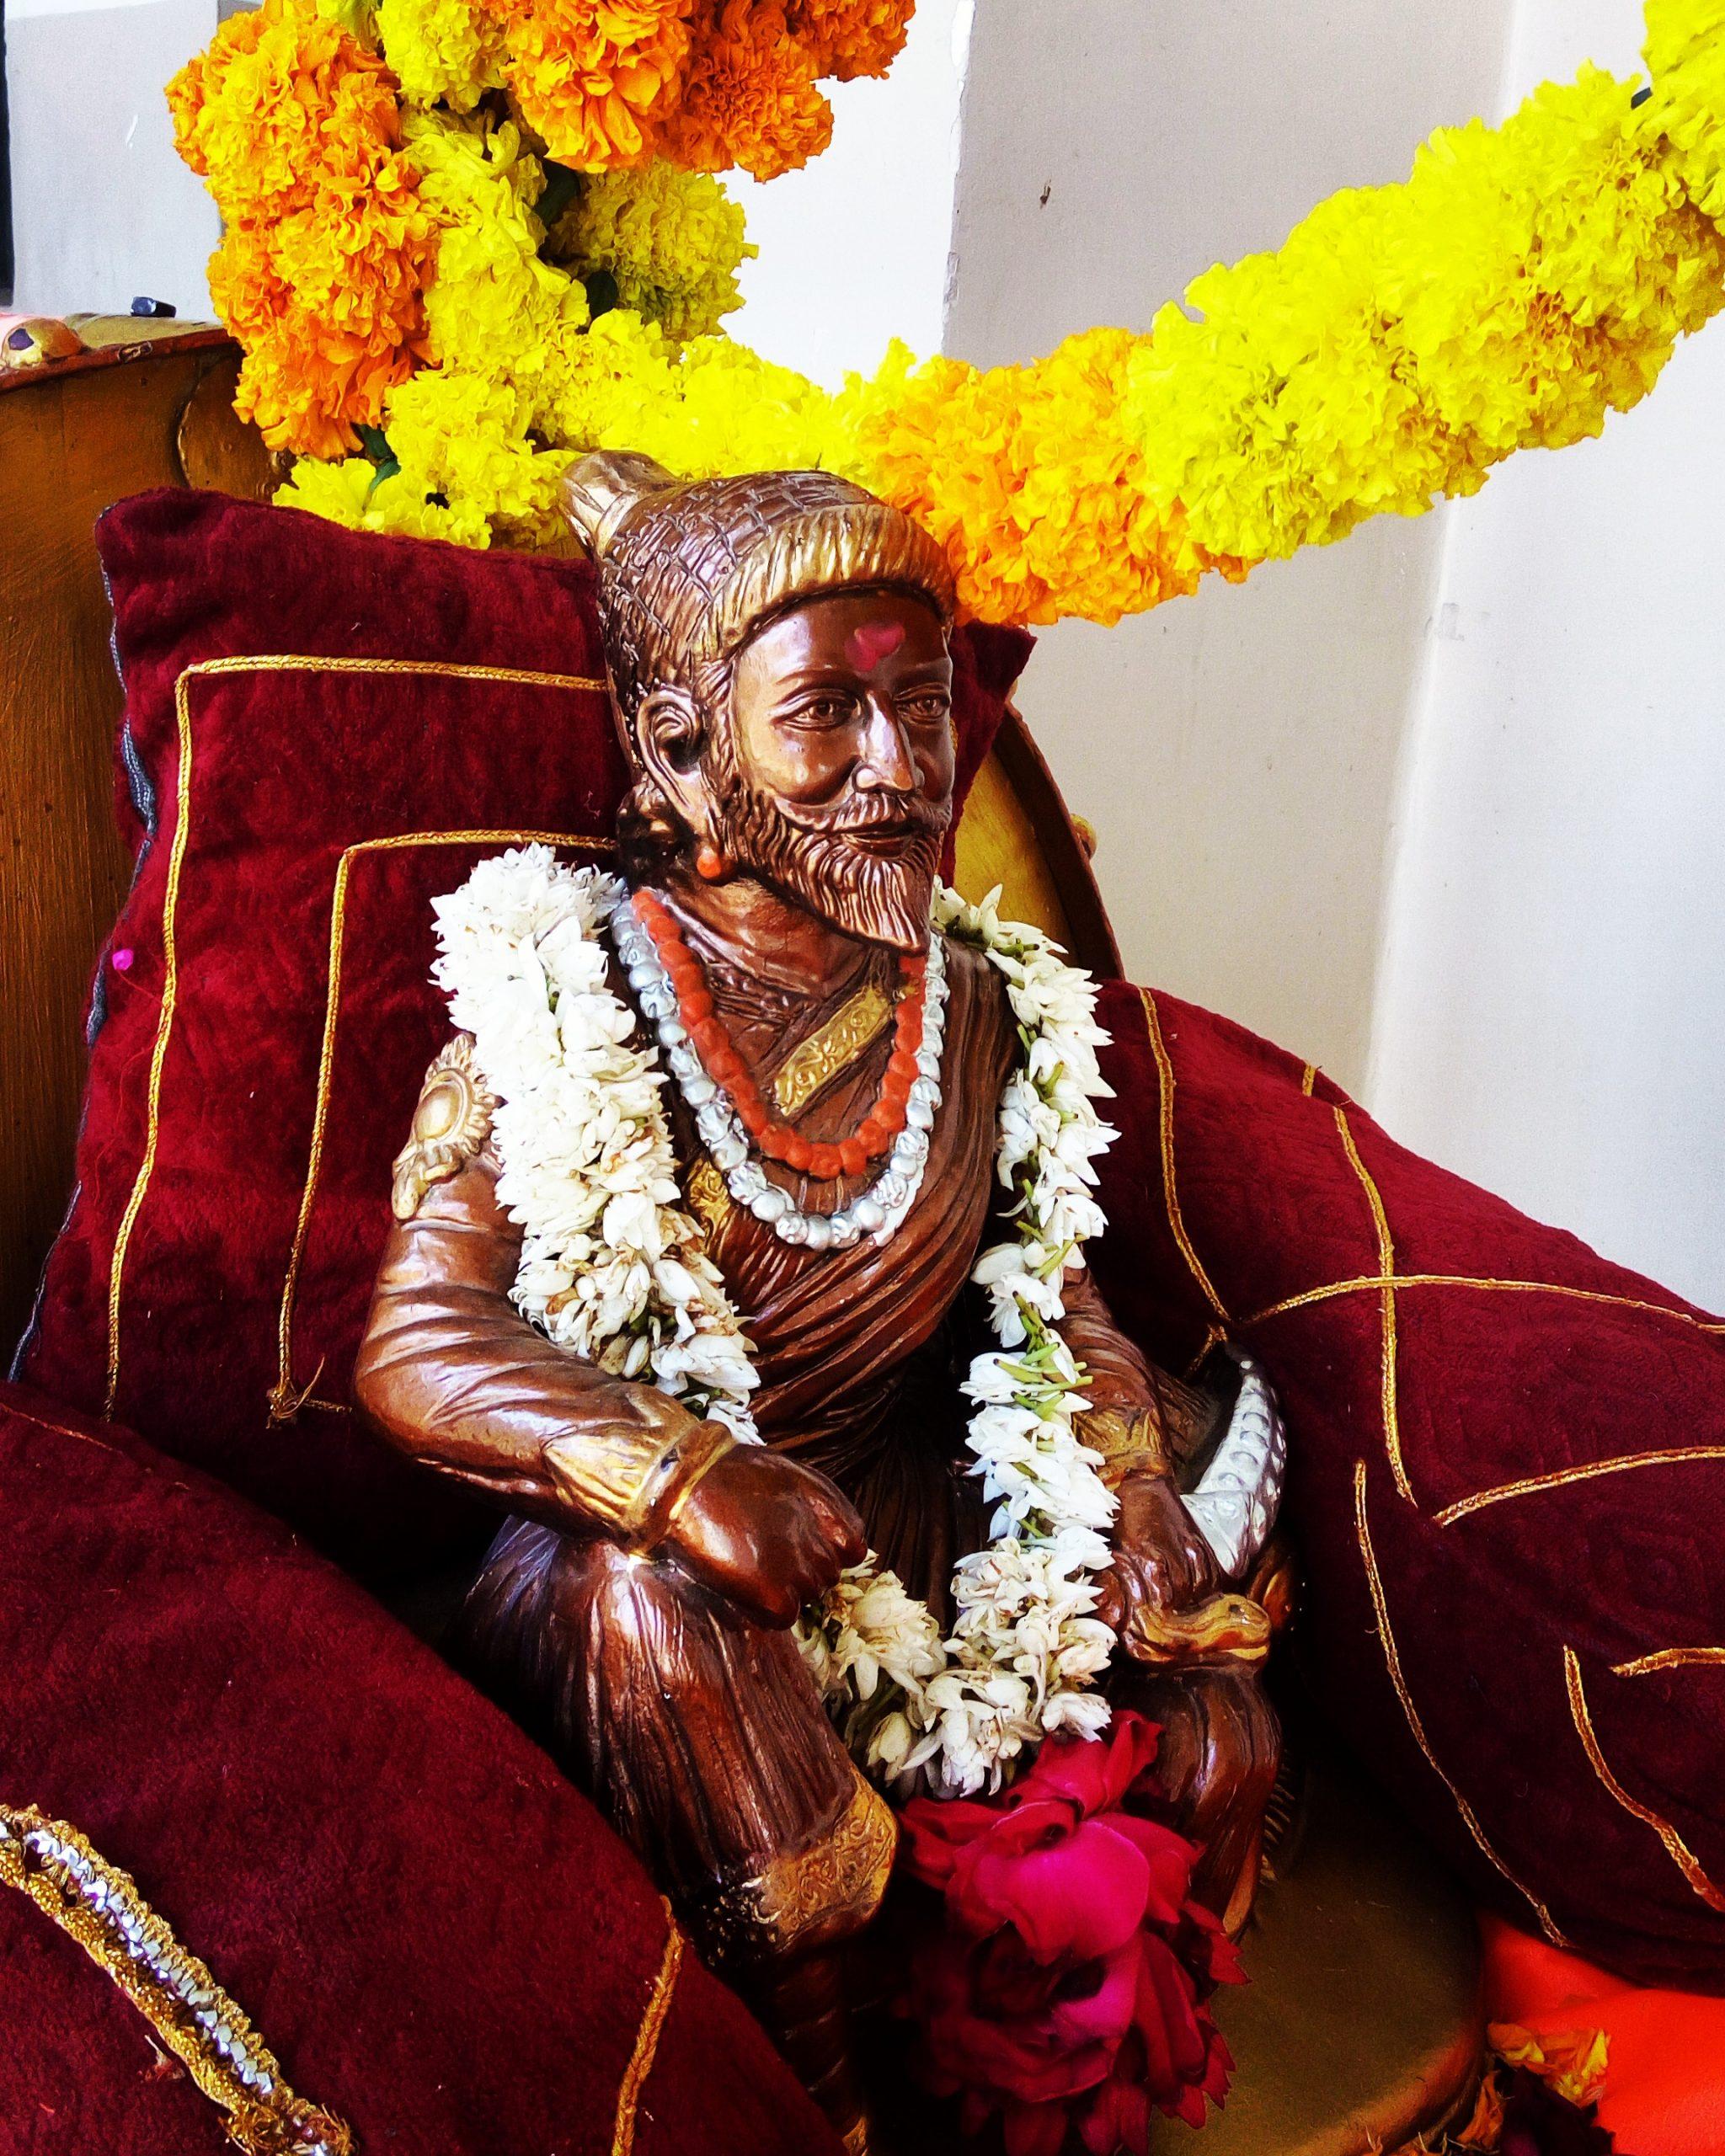 Shivaji - The King of everyone's heart